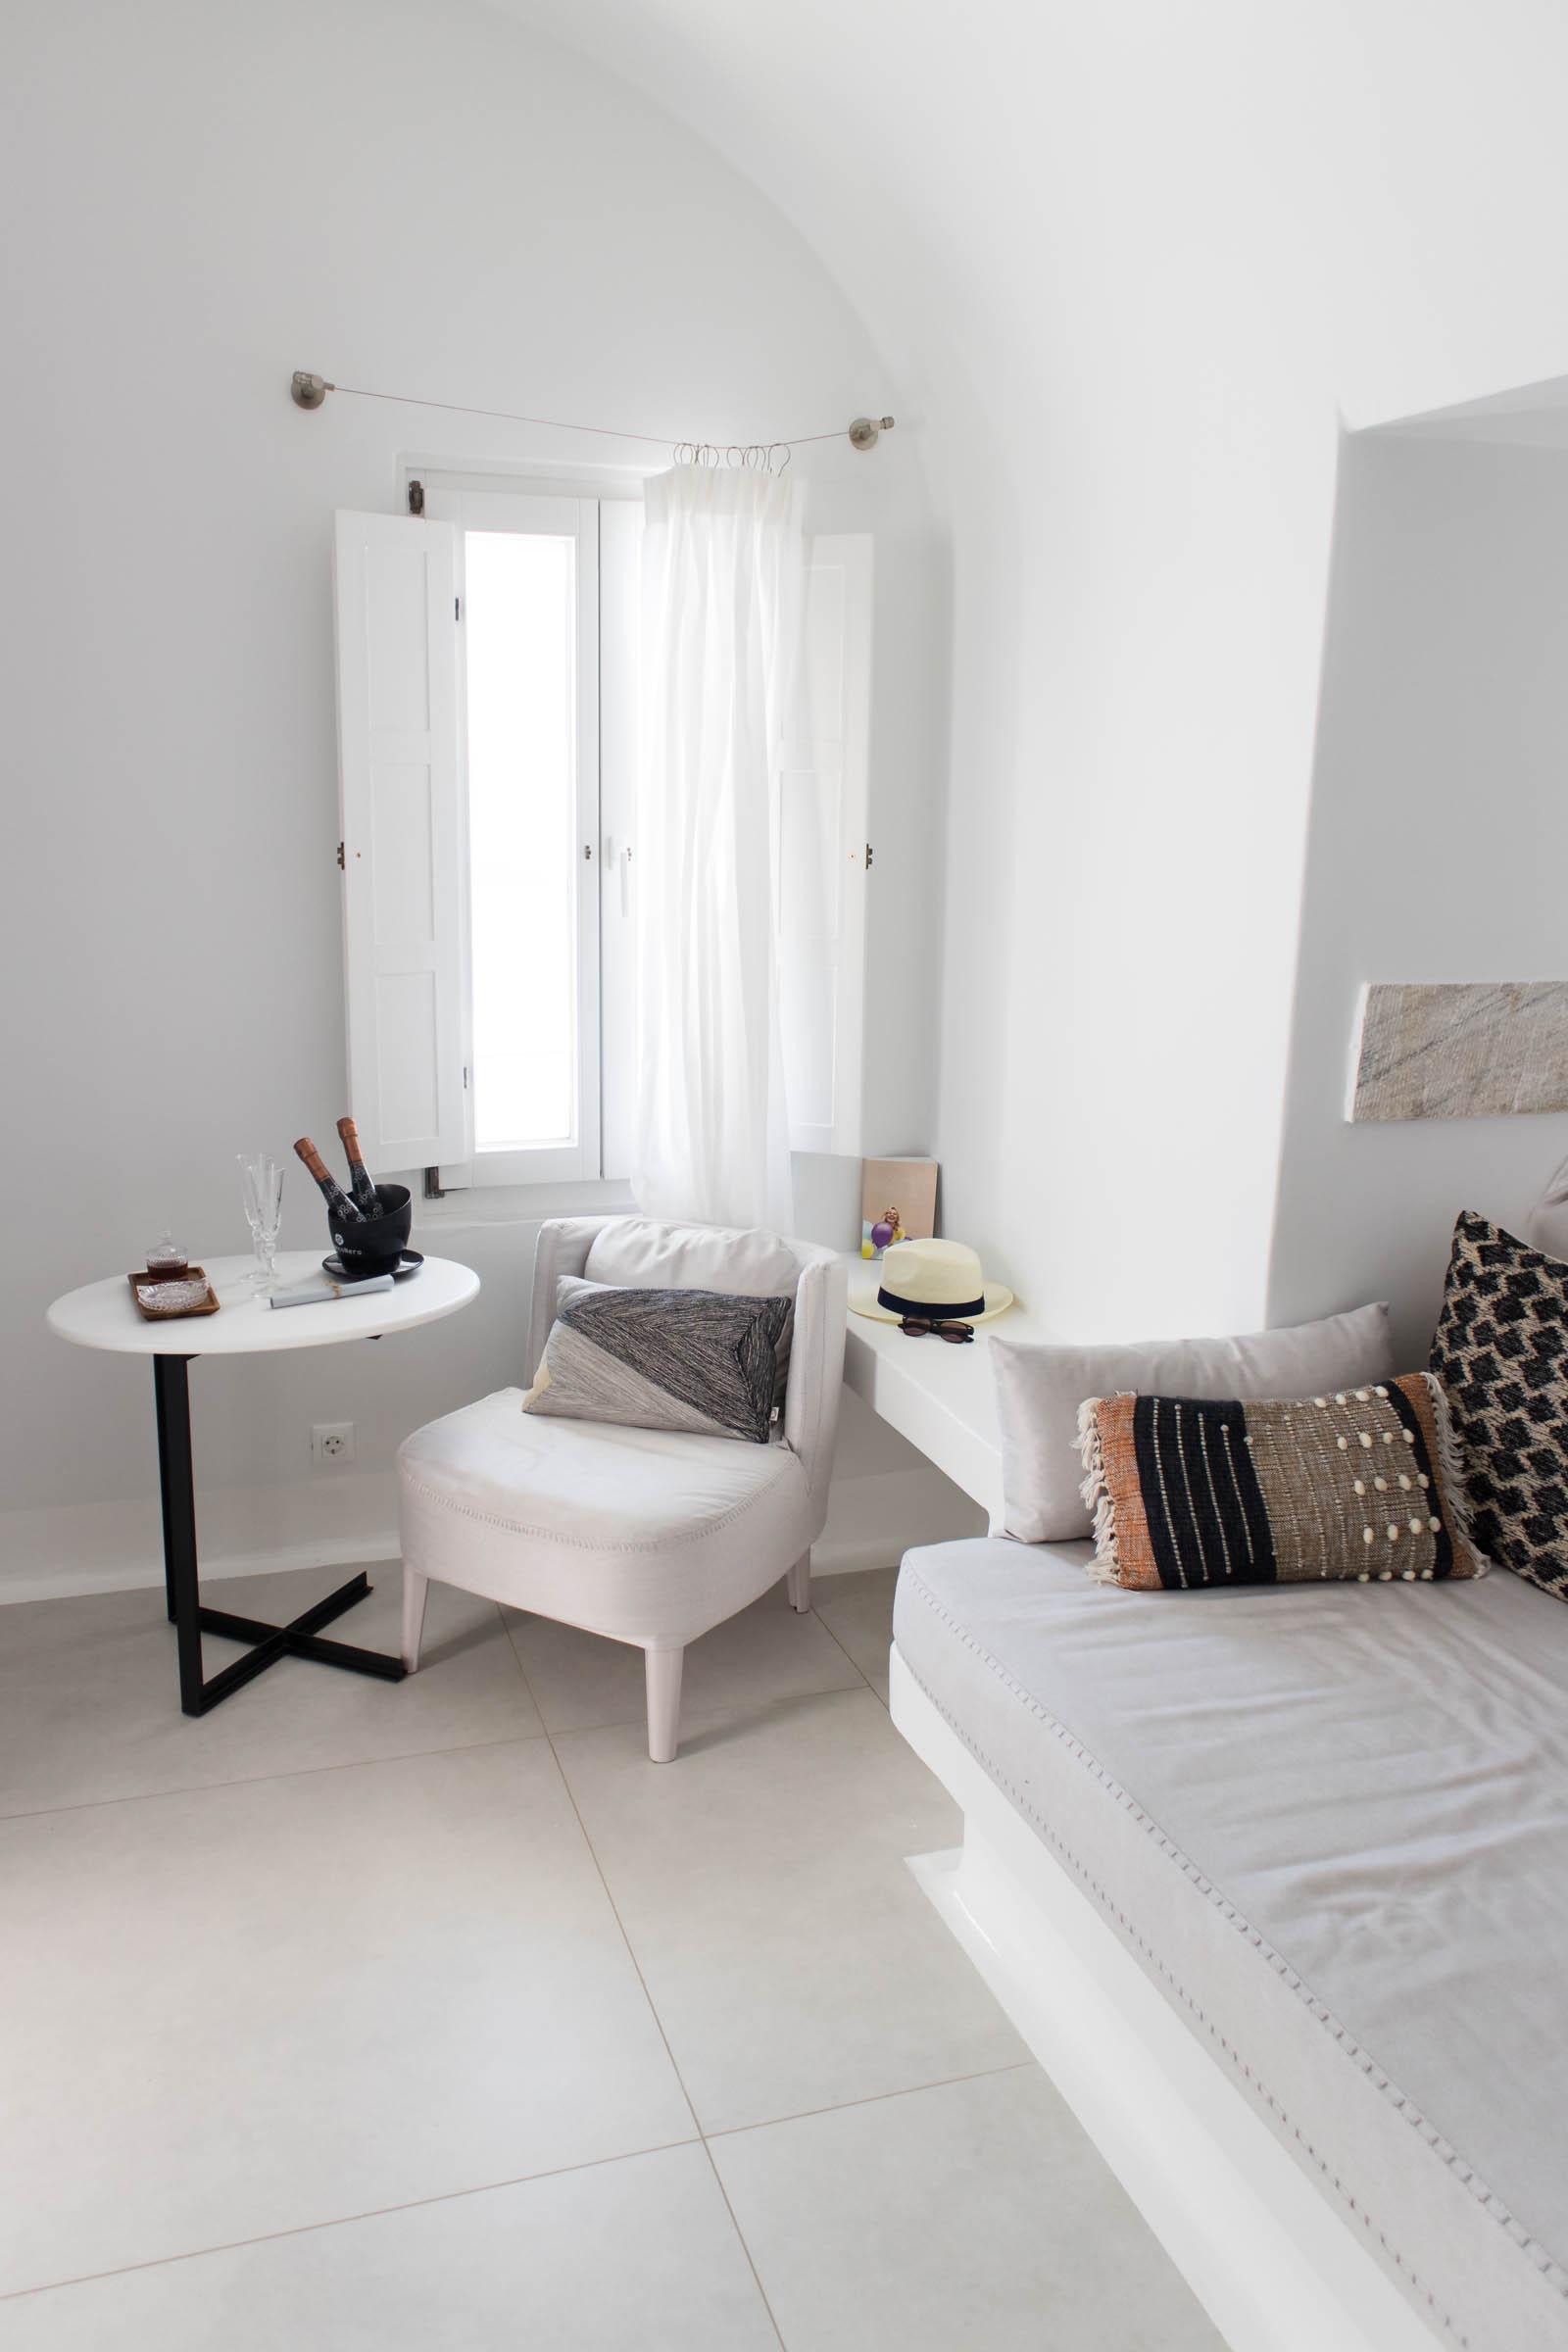 cosmopolitan suites Santorini